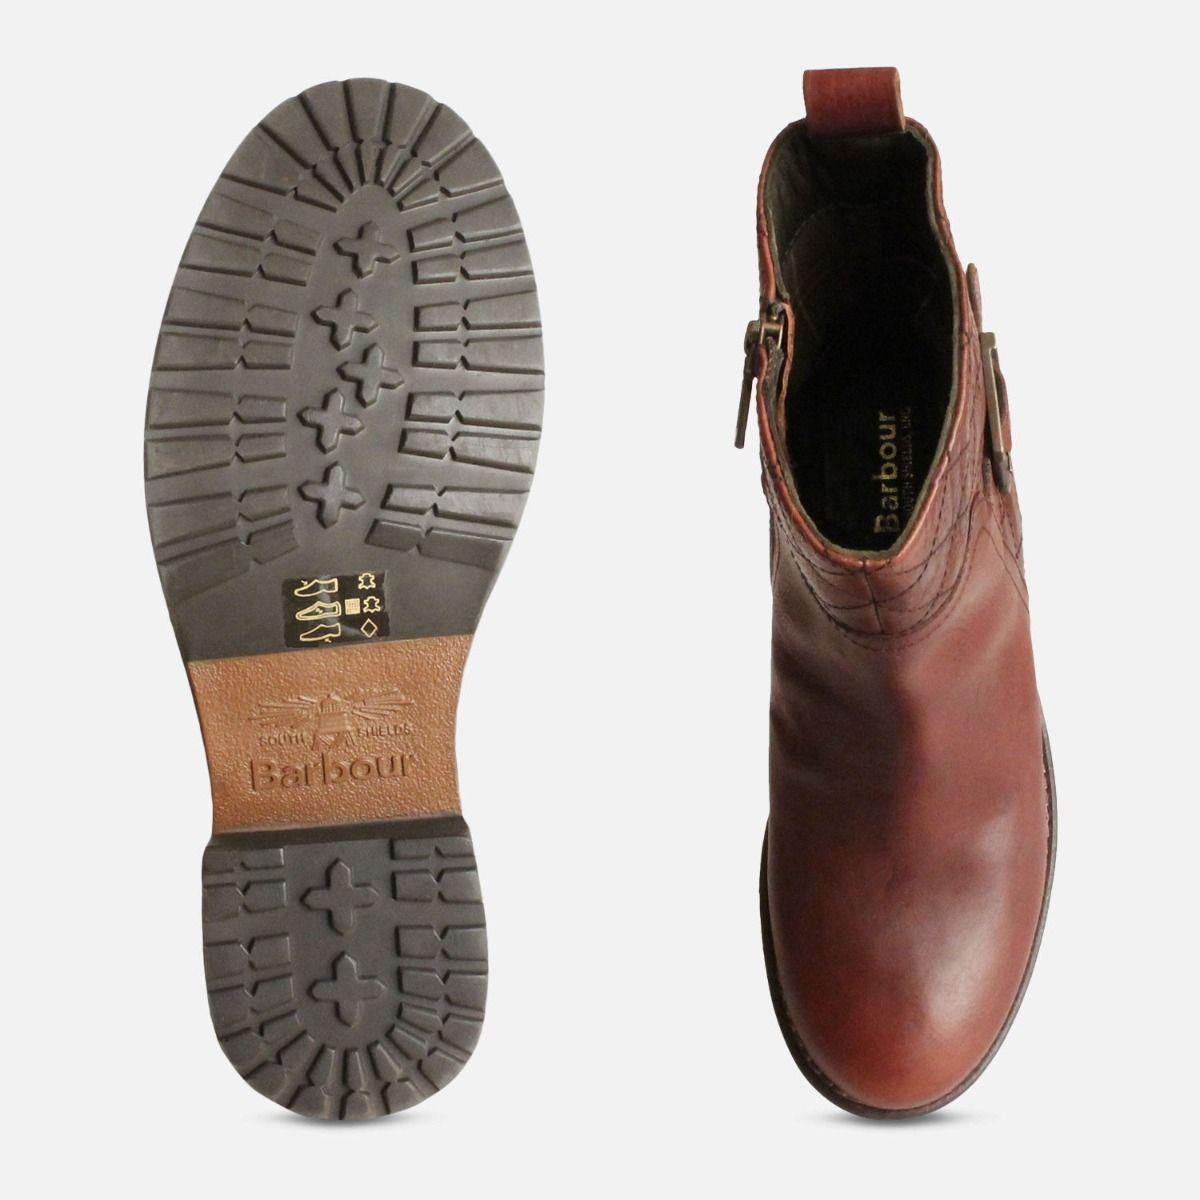 New Chestnut Ladies Lambeth Barbour Zip Boots